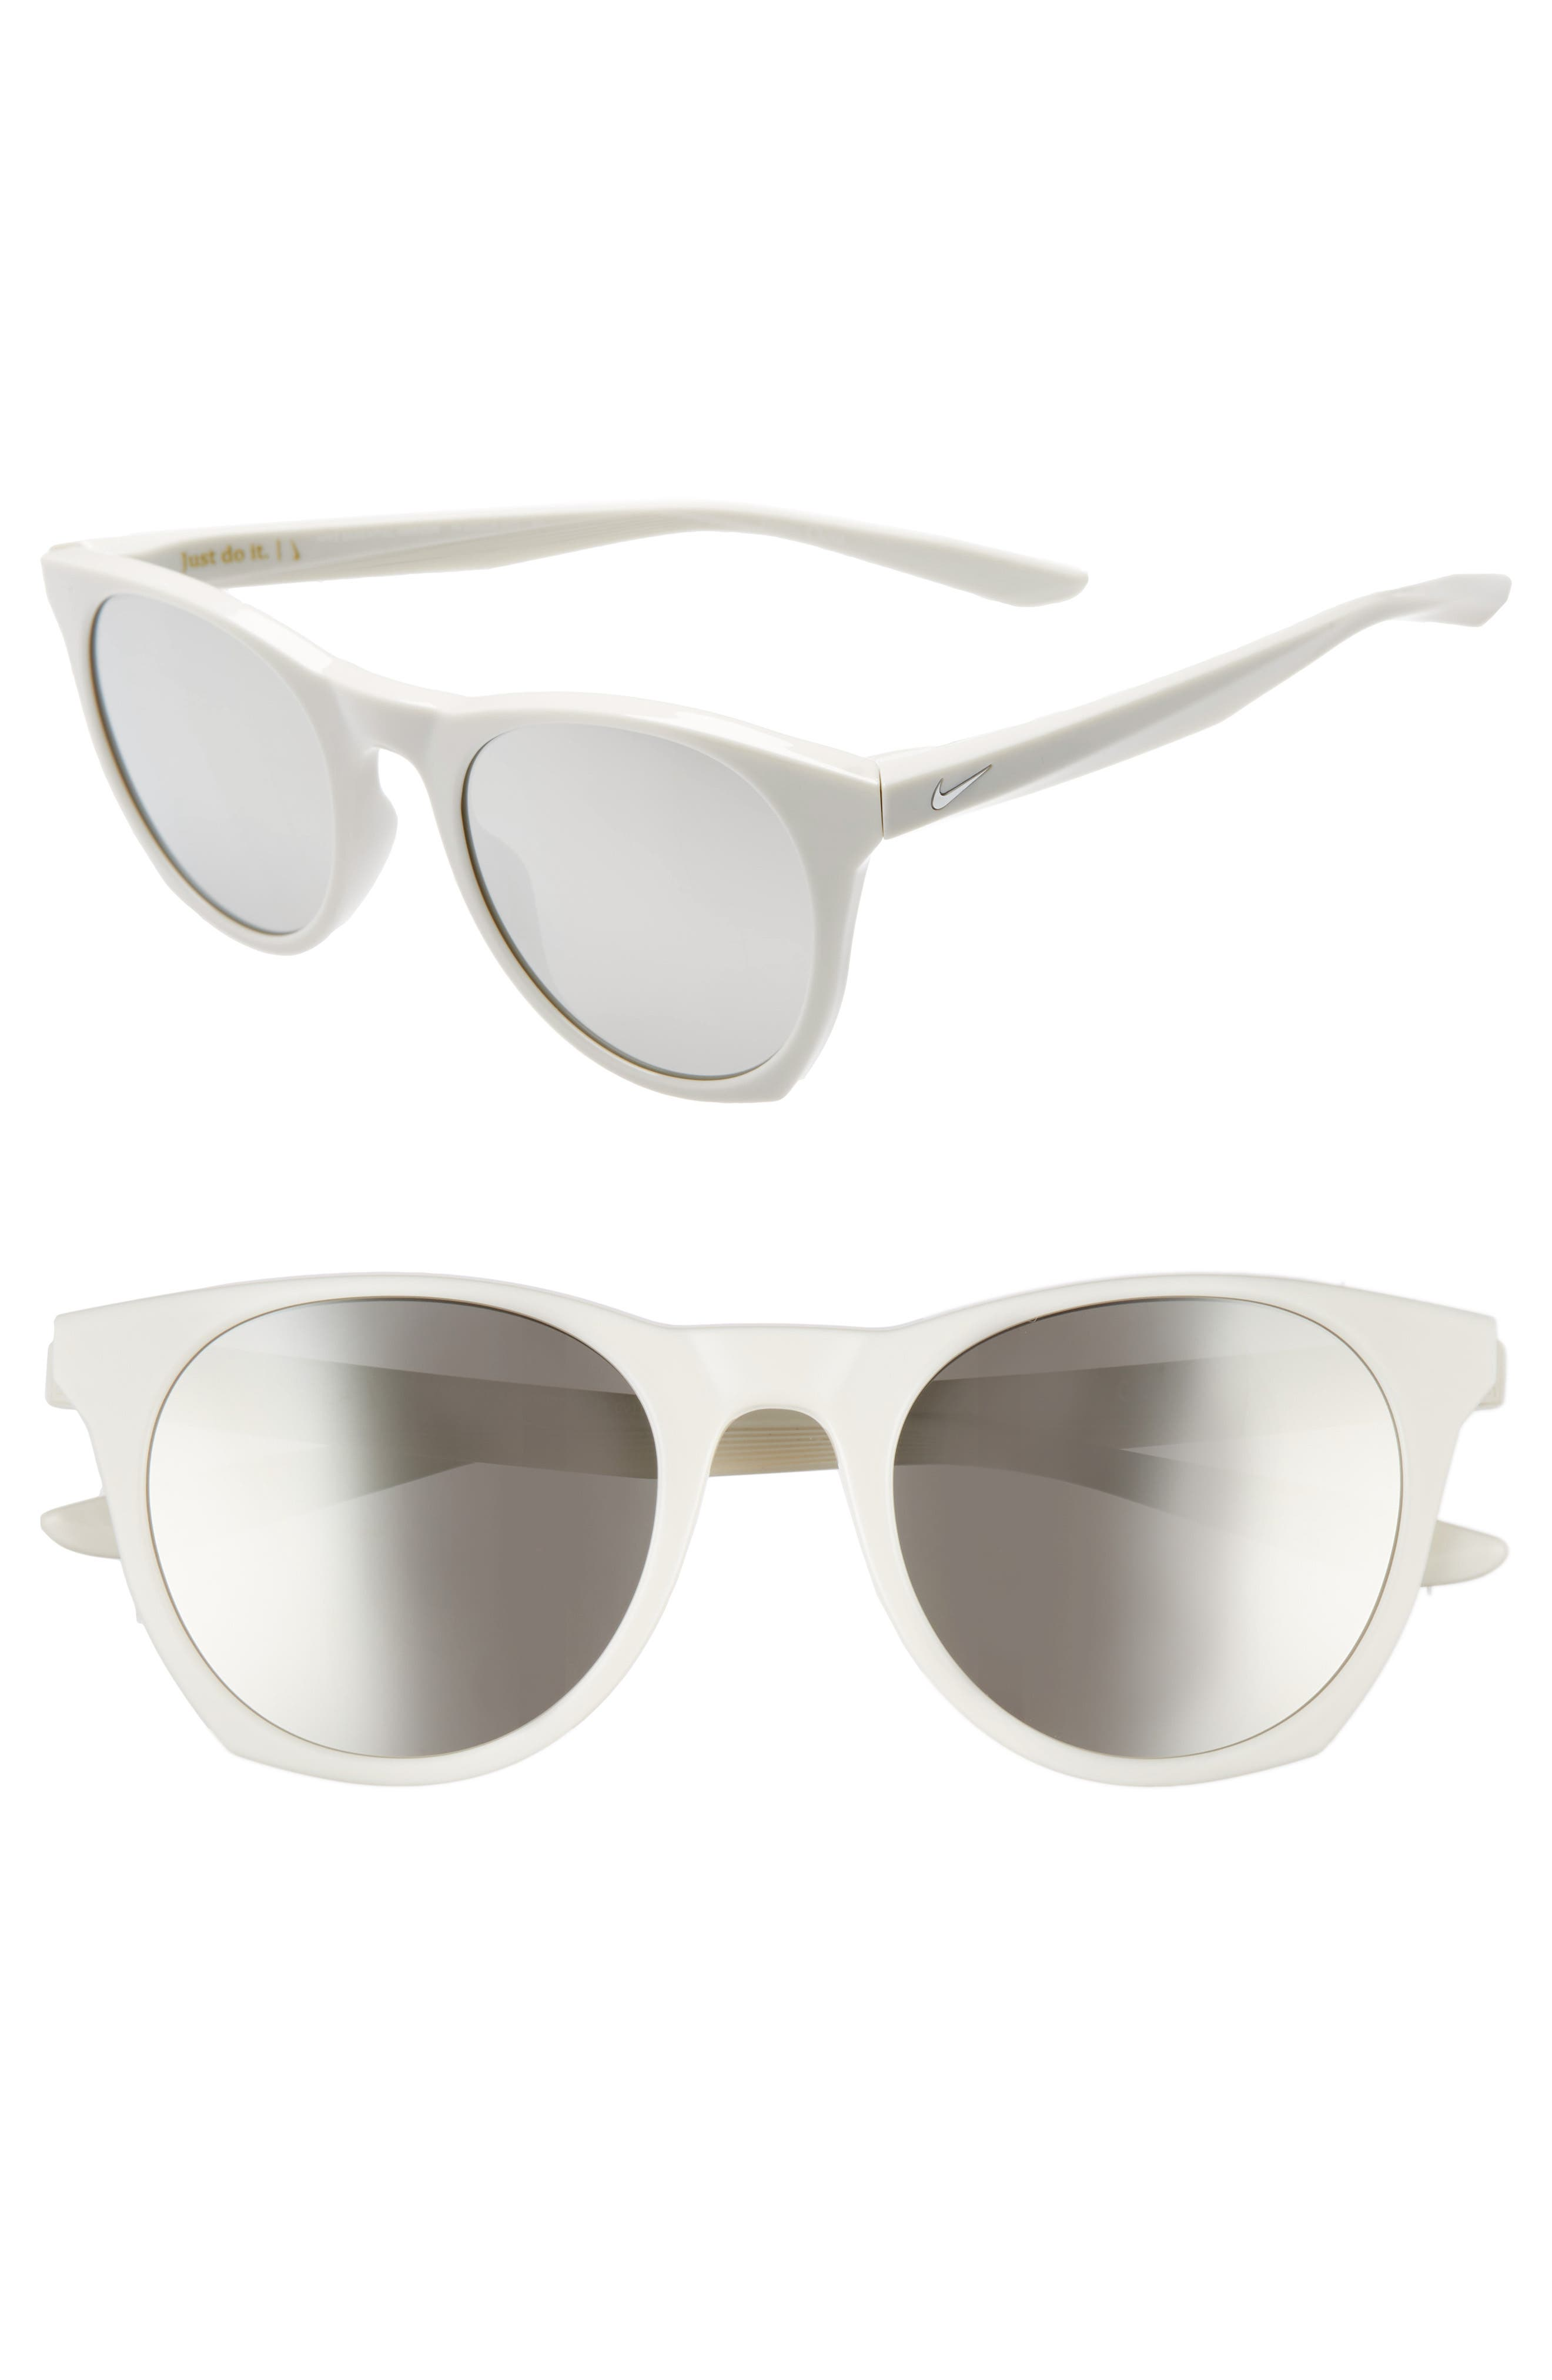 Nike Essential Horizon 51Mm Mirror Sunglasses - Light Bone Grey/ Grey